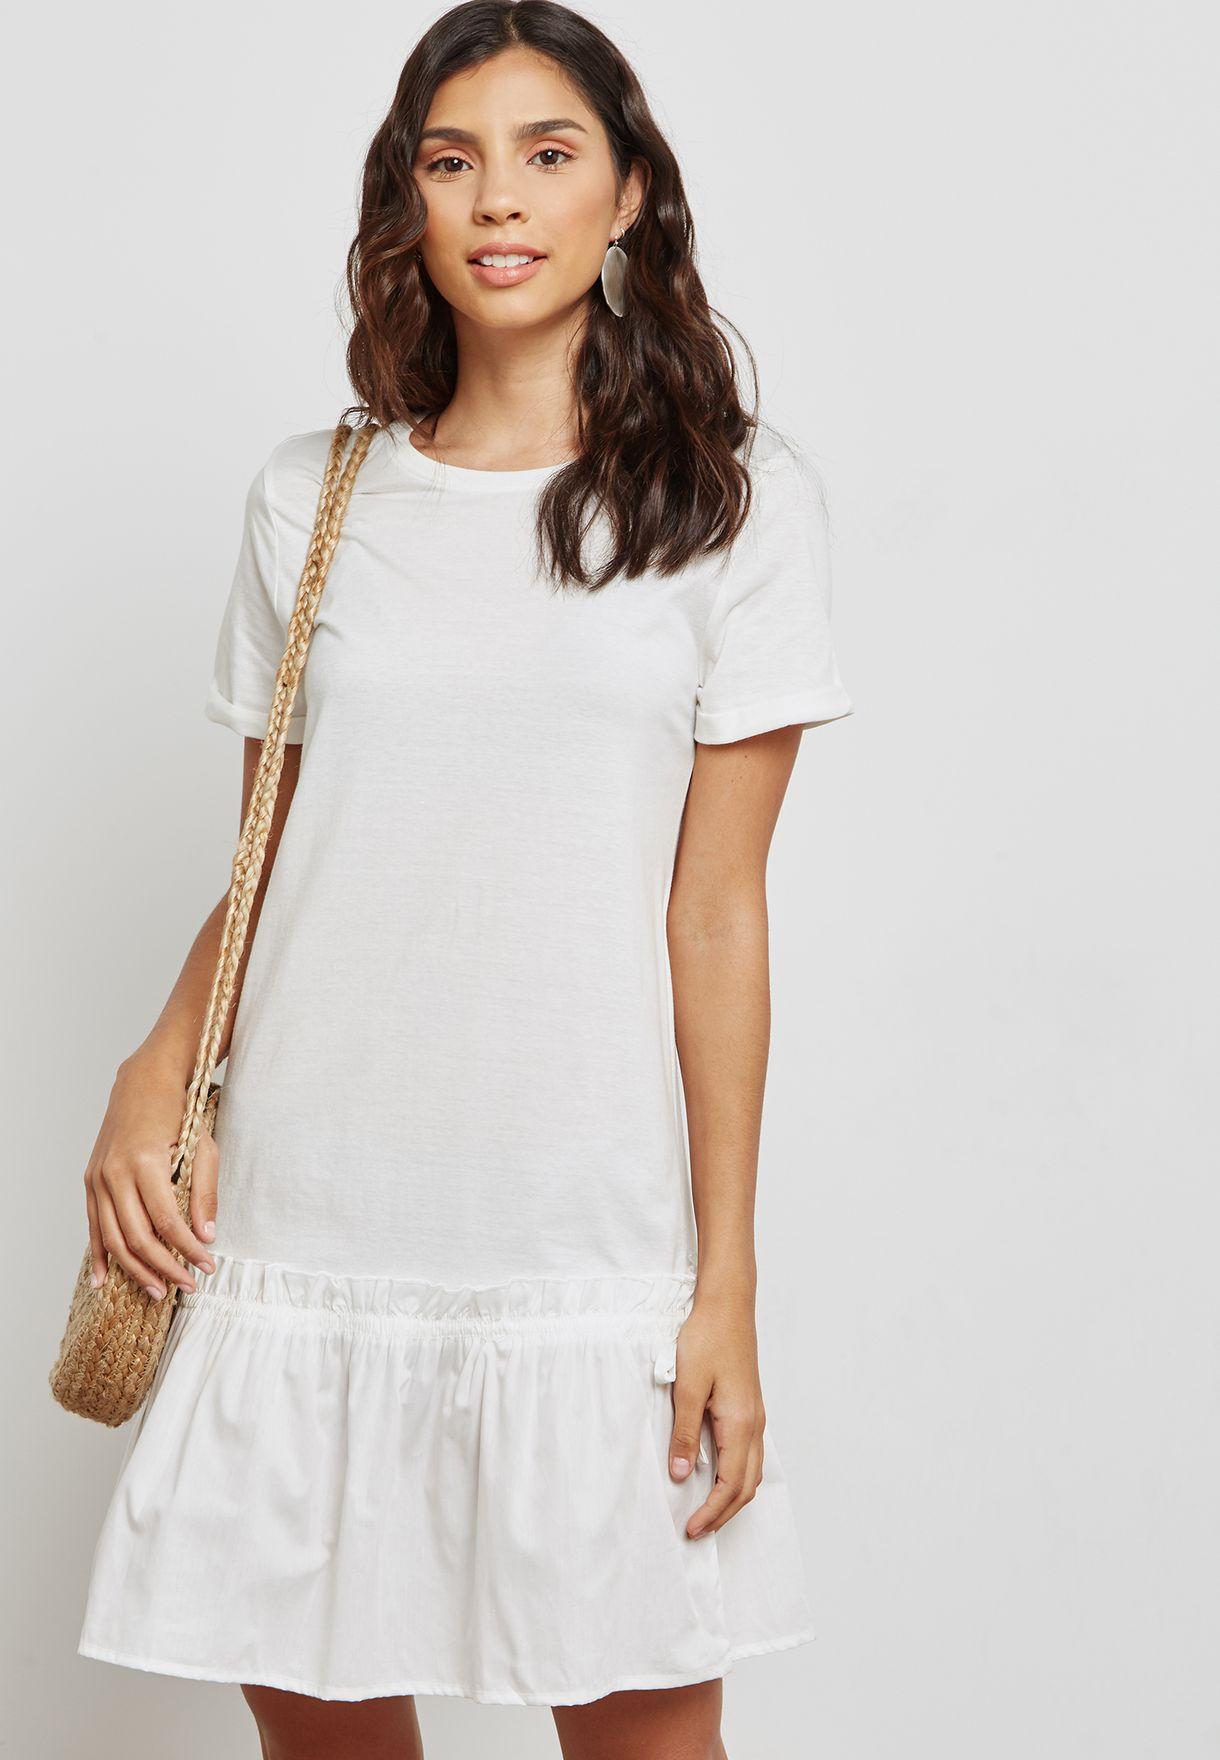 8127ea63c79 Shop Noisy May white Peplum Dress 27002372 for Women in Saudi - NO577AT39TQE